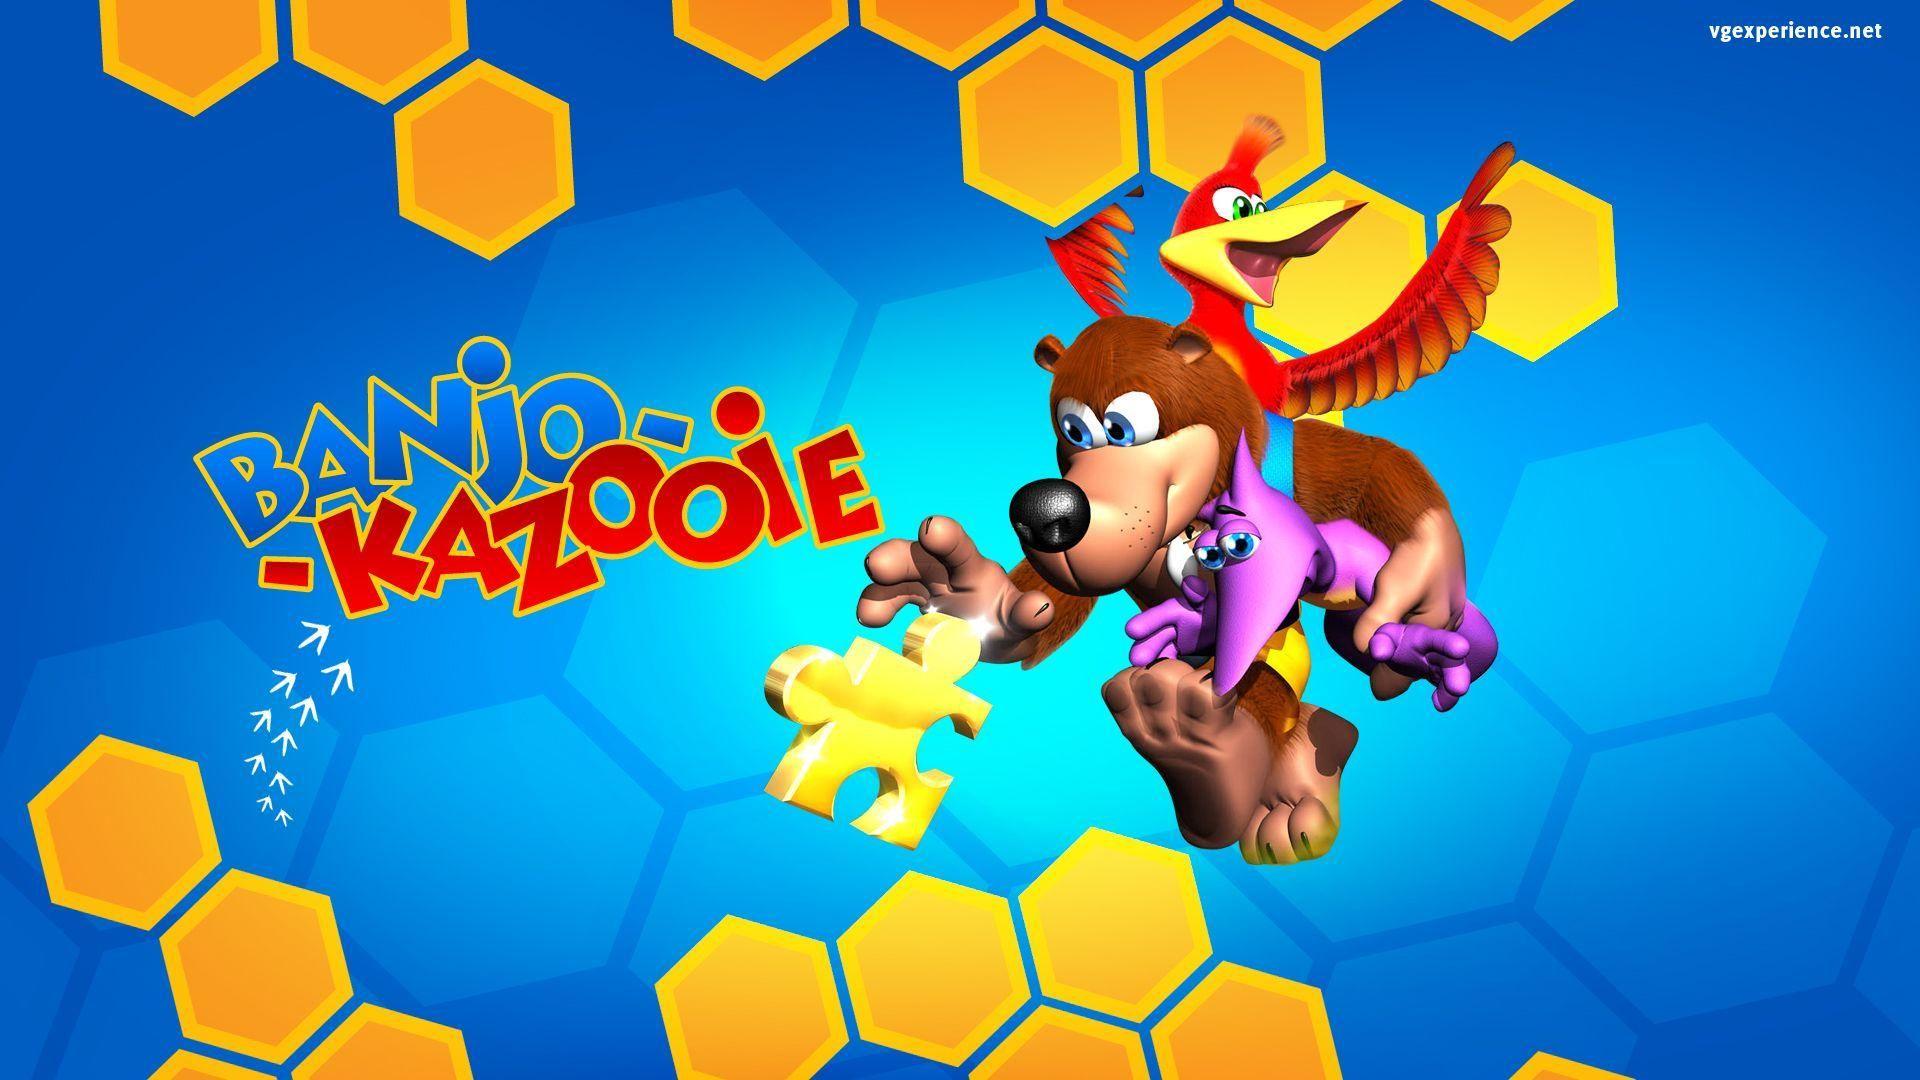 Games Banjo Kazooie Nuts Bolts Banjo Tooie Hd Wallpaper In 2020 Banjo Kazooie Banjo Ps Vita Wallpaper